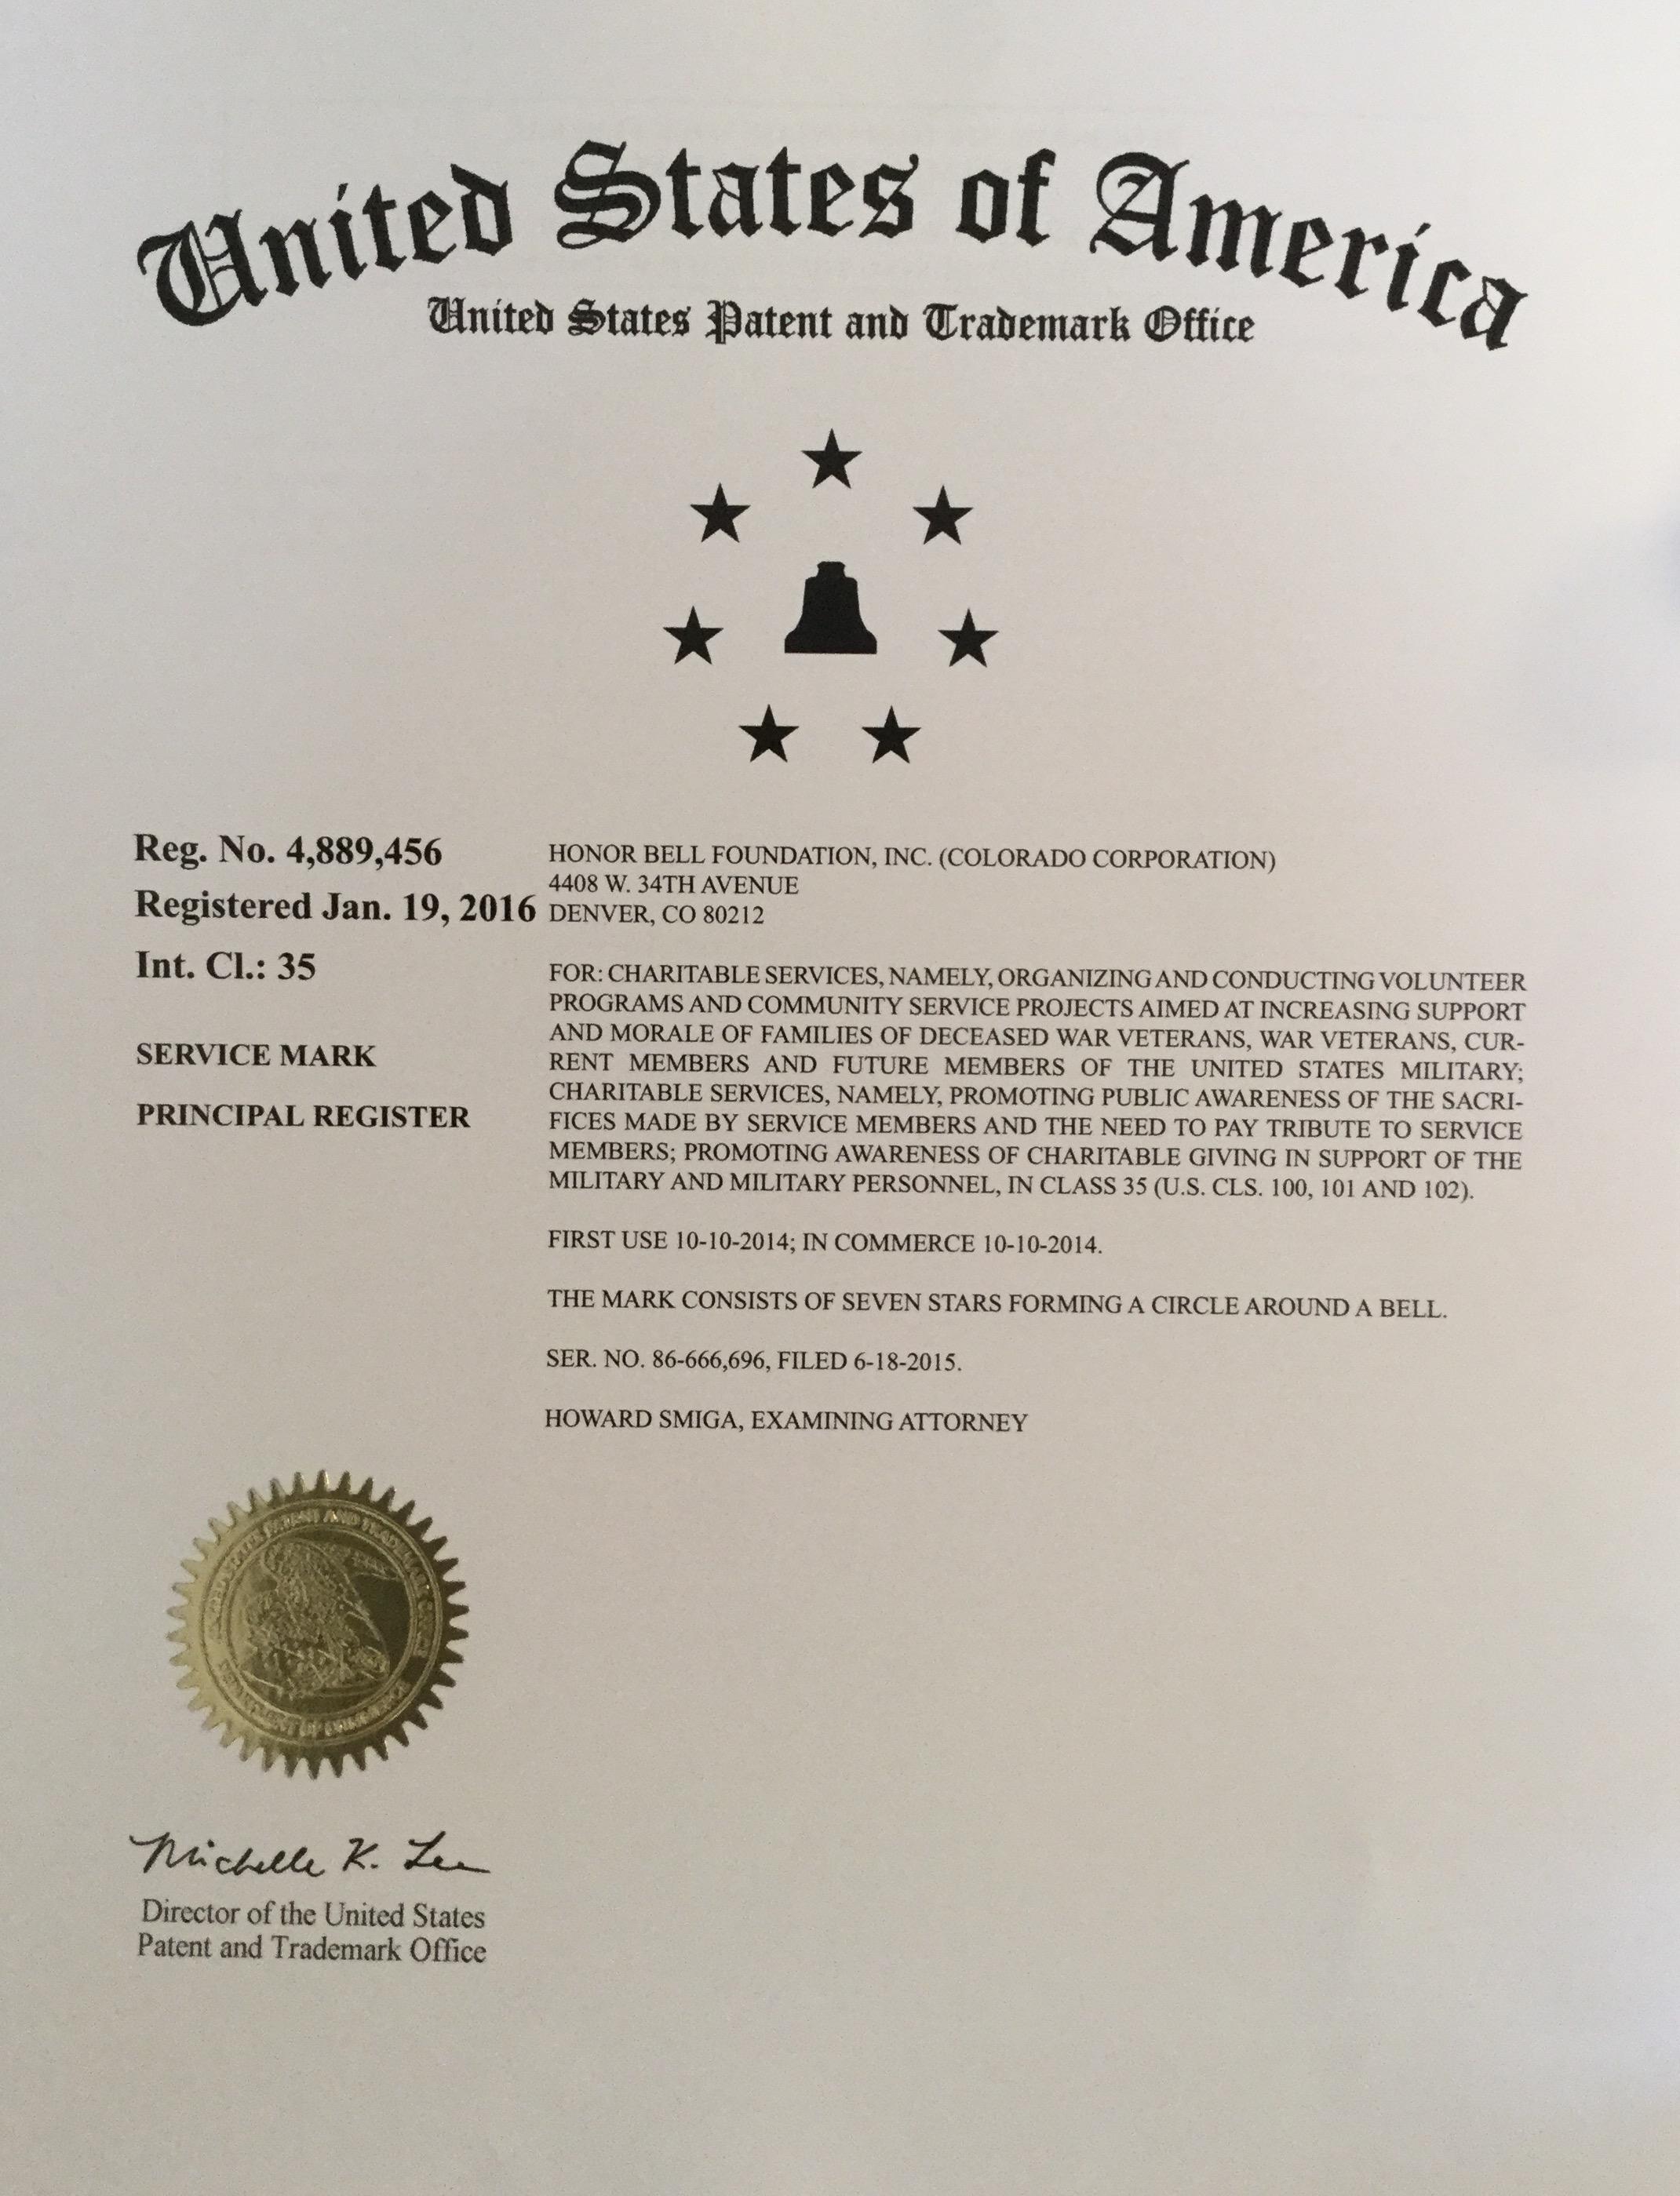 Our trademark registration letter.